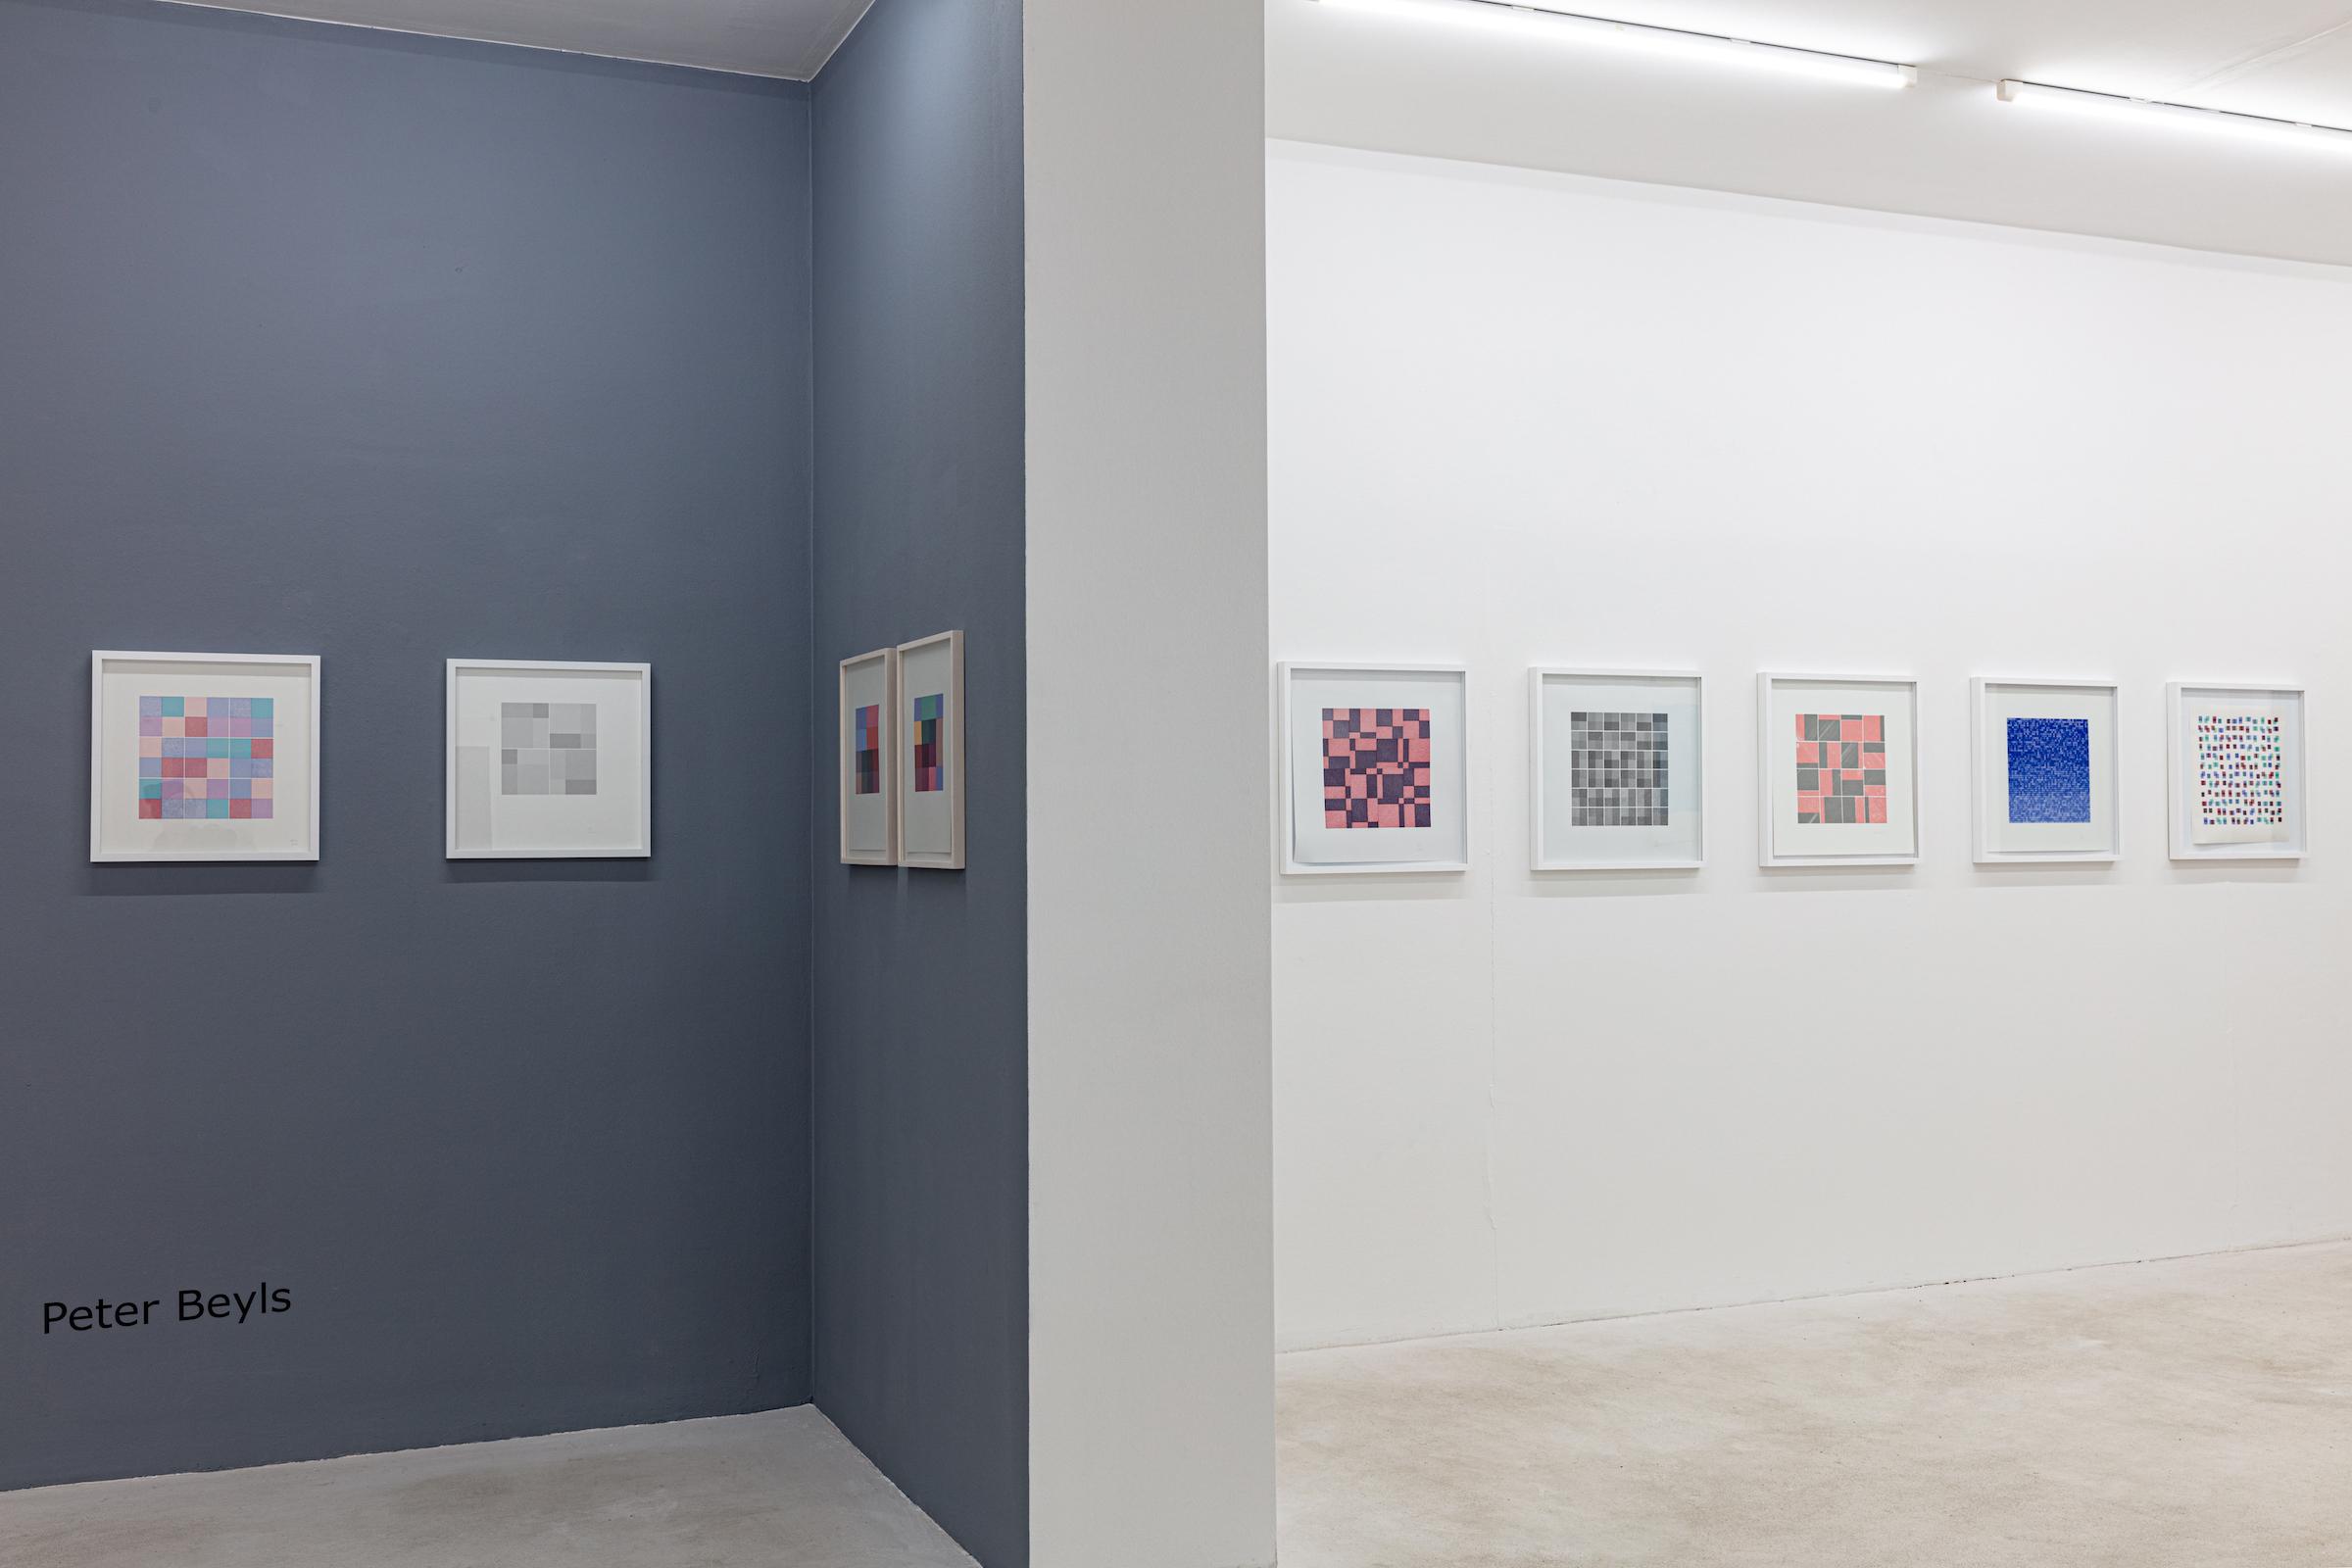 Algorithmic Introspections, Ausstellungsansicht, 2019